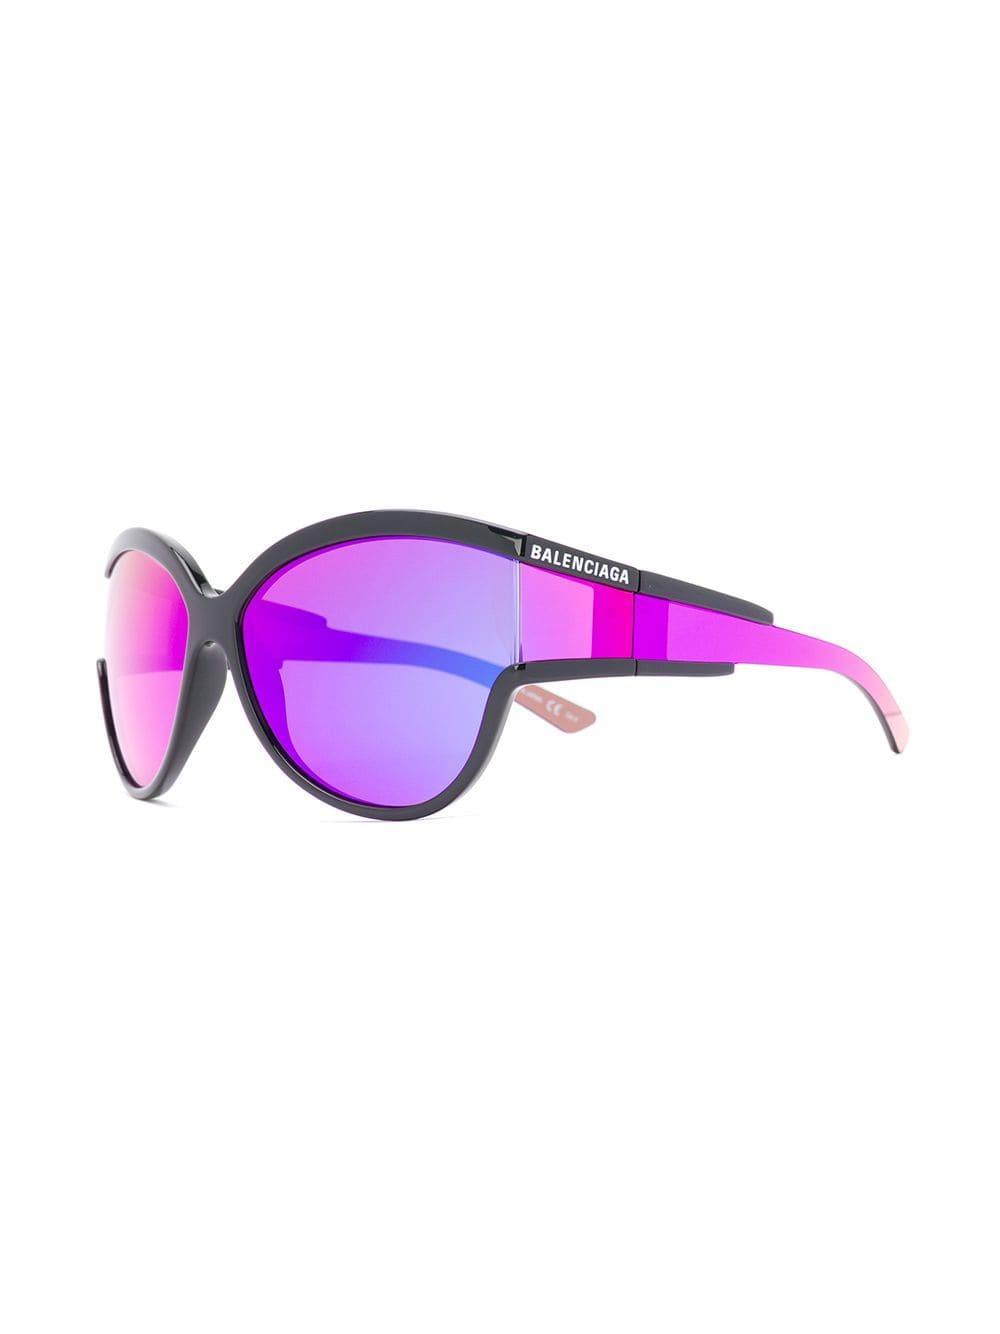 a477394f233e3 Balenciaga - Black Unlimited Round Sunglasses - Lyst. View fullscreen